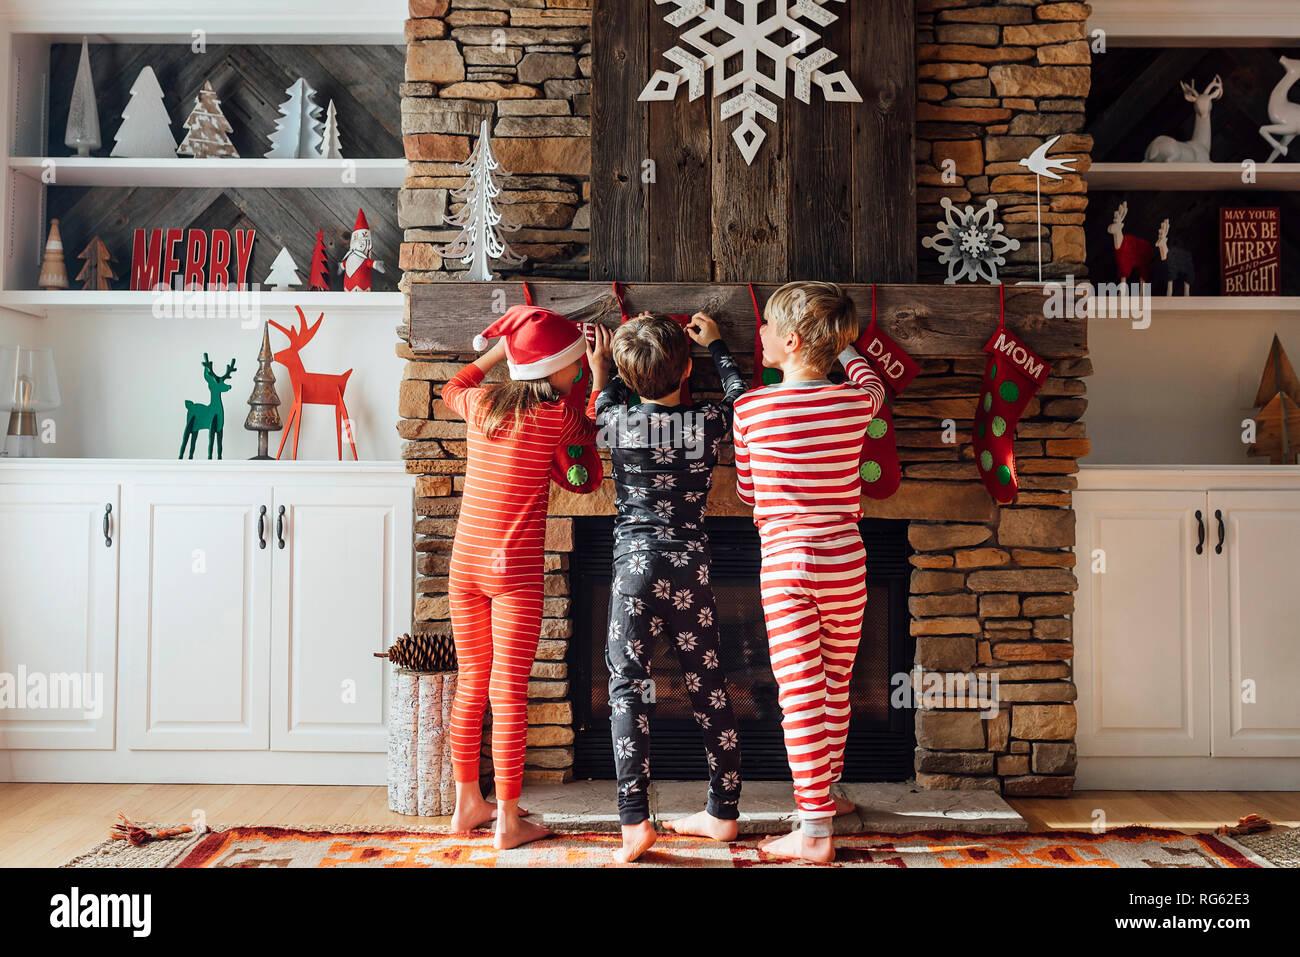 Children With Christmas Stockings Stock Photos & Children ...